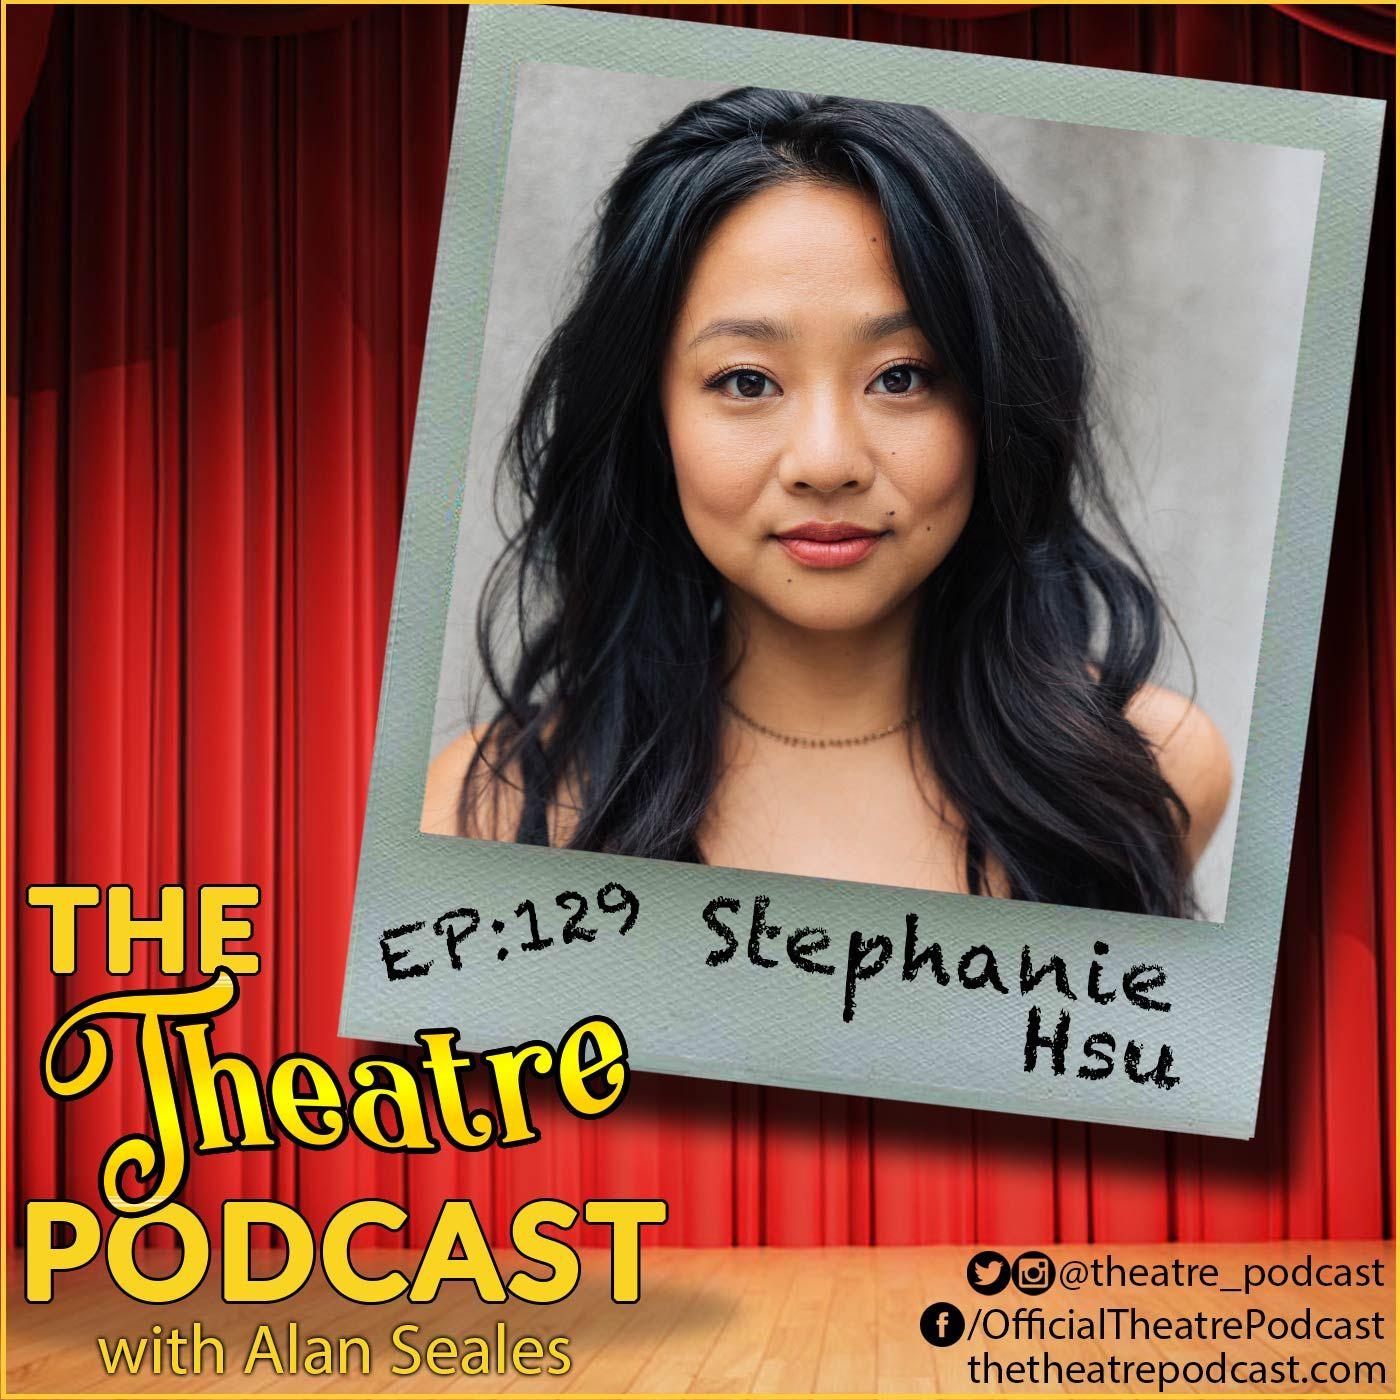 Ep129 - Stephanie Hsu: Be More Chill, Spongebob Squarepants, The Marvelous Mrs. Maisel